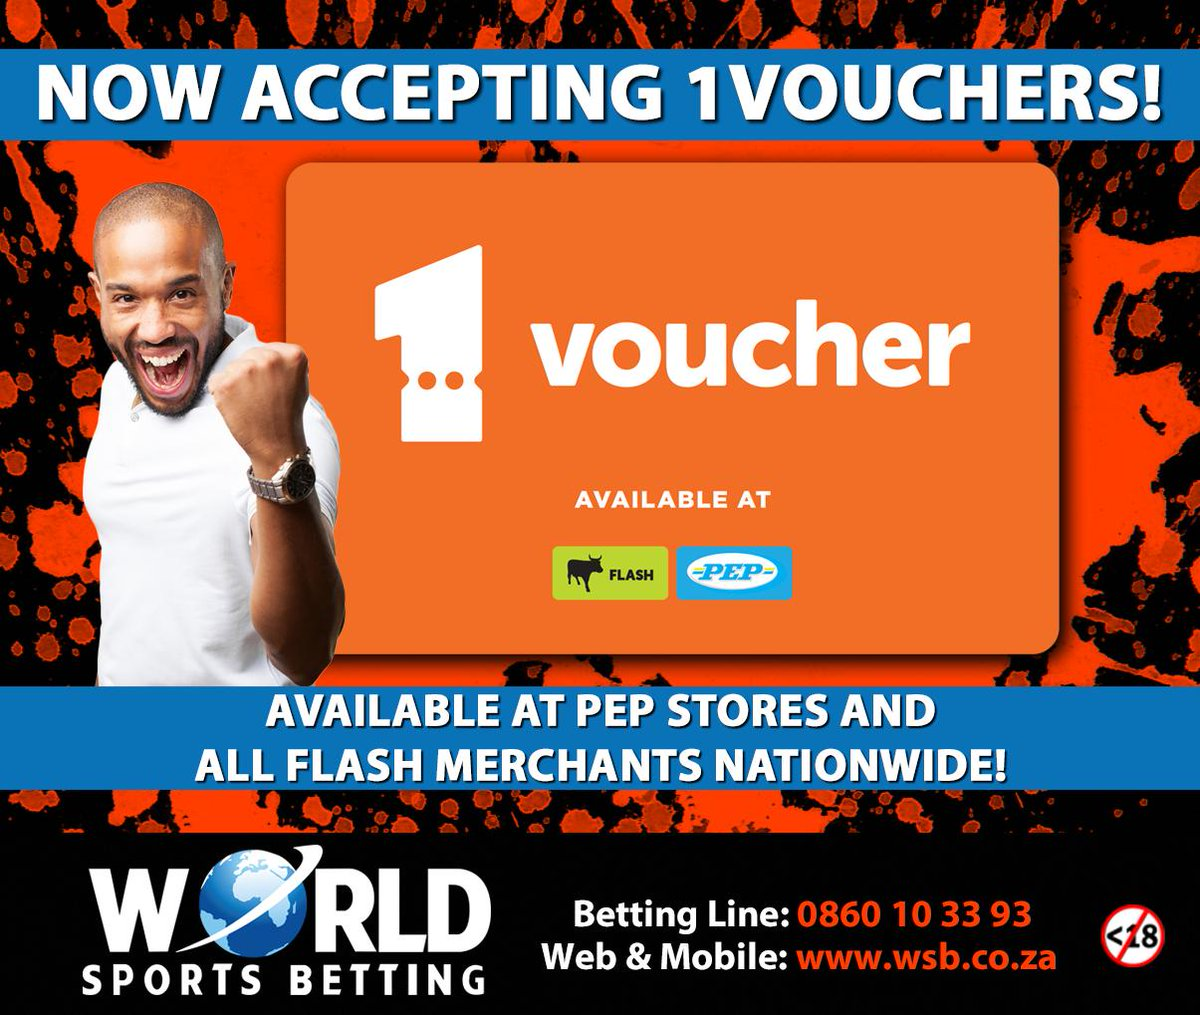 world sports betting vouchers